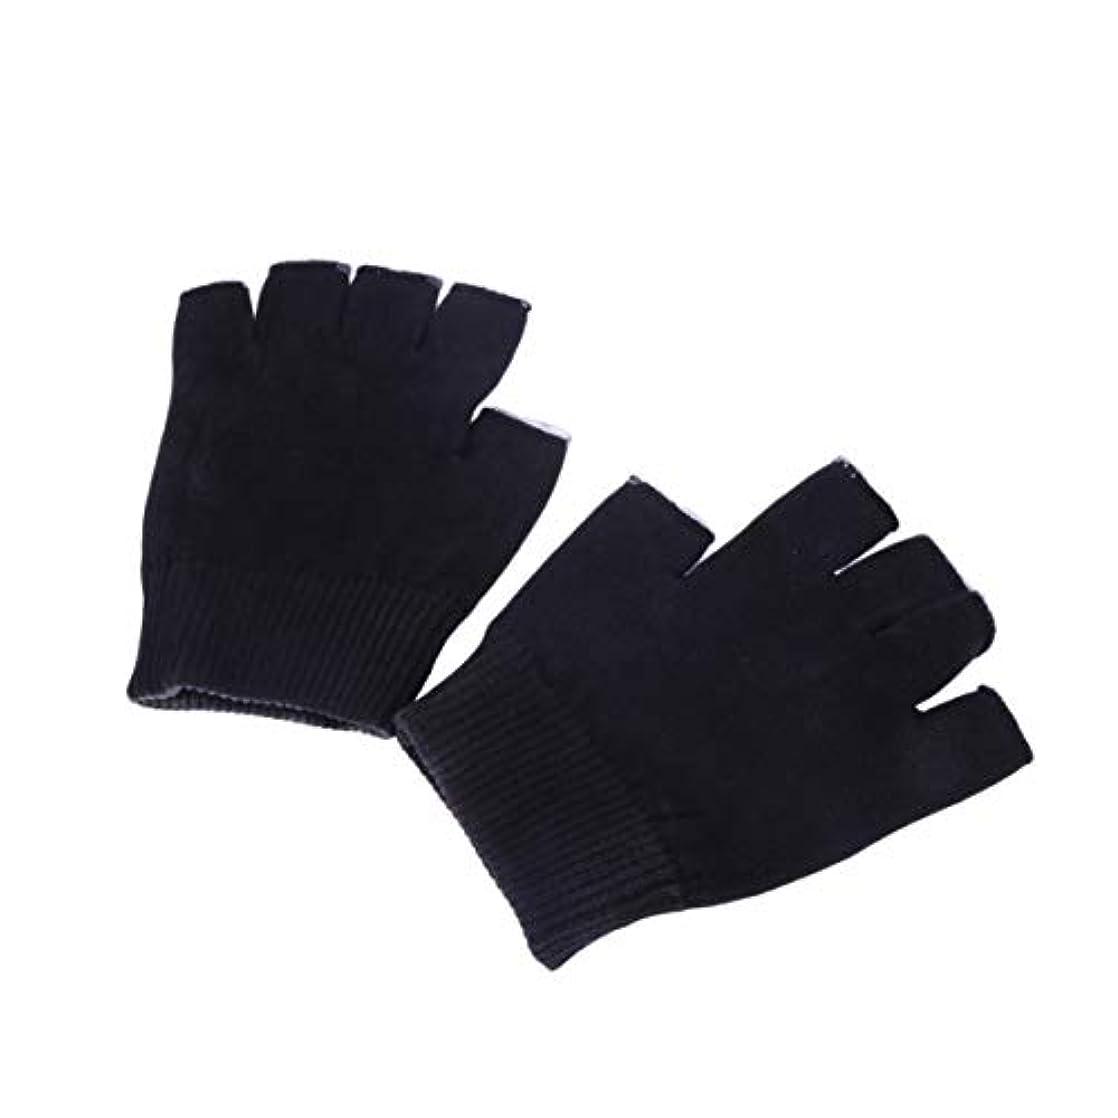 Healifty 保湿手袋ゲル手袋サイズm(黒)